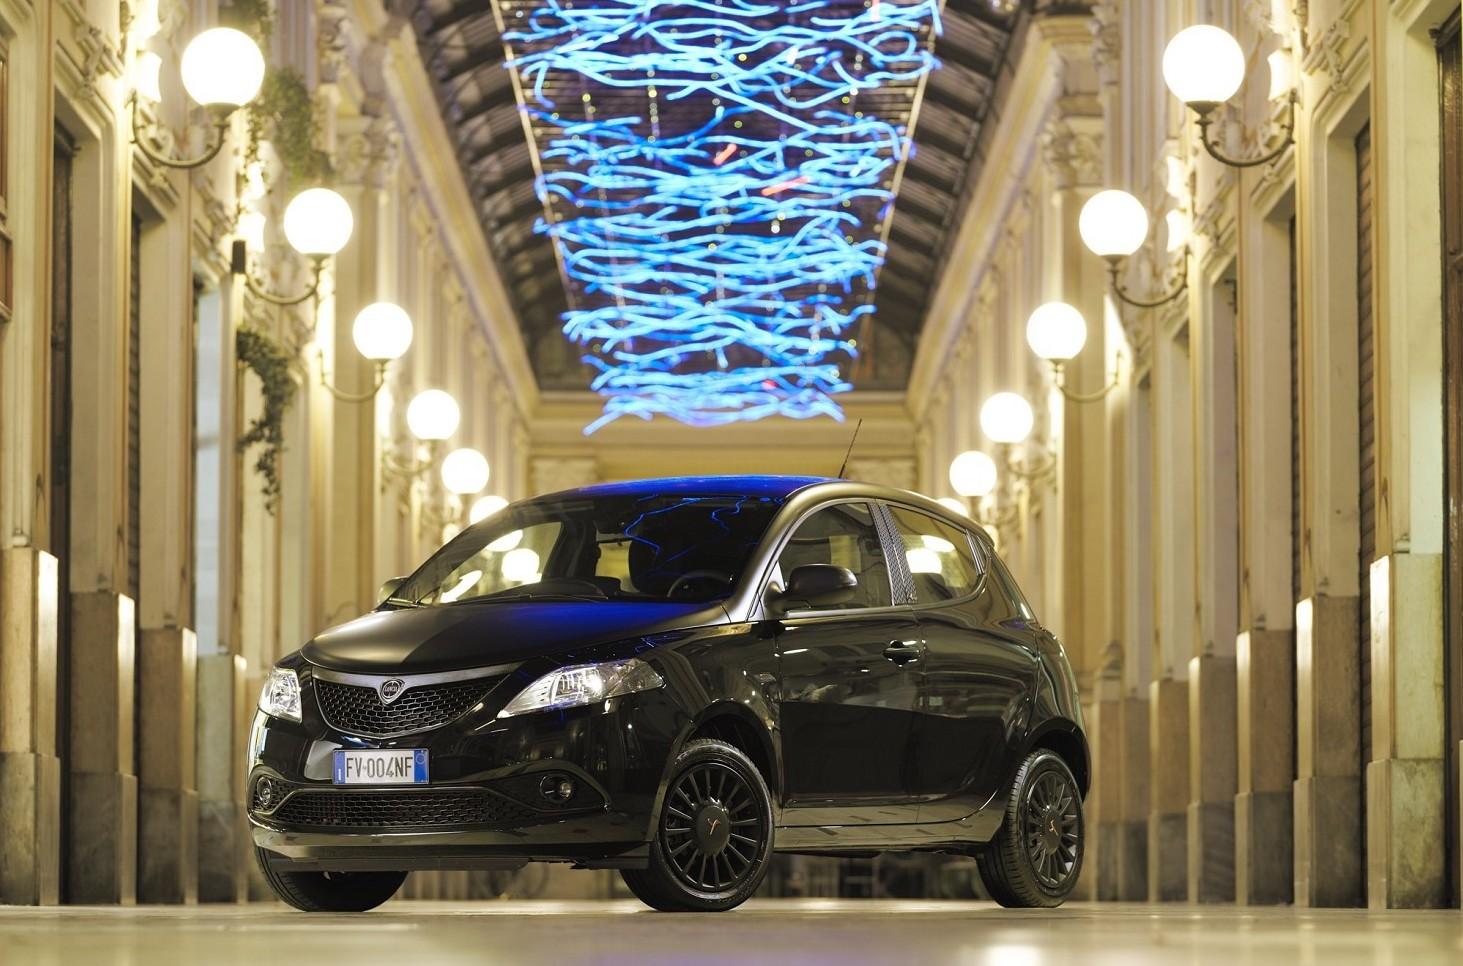 Lancia Ypsilon speciale: Black and Noir.